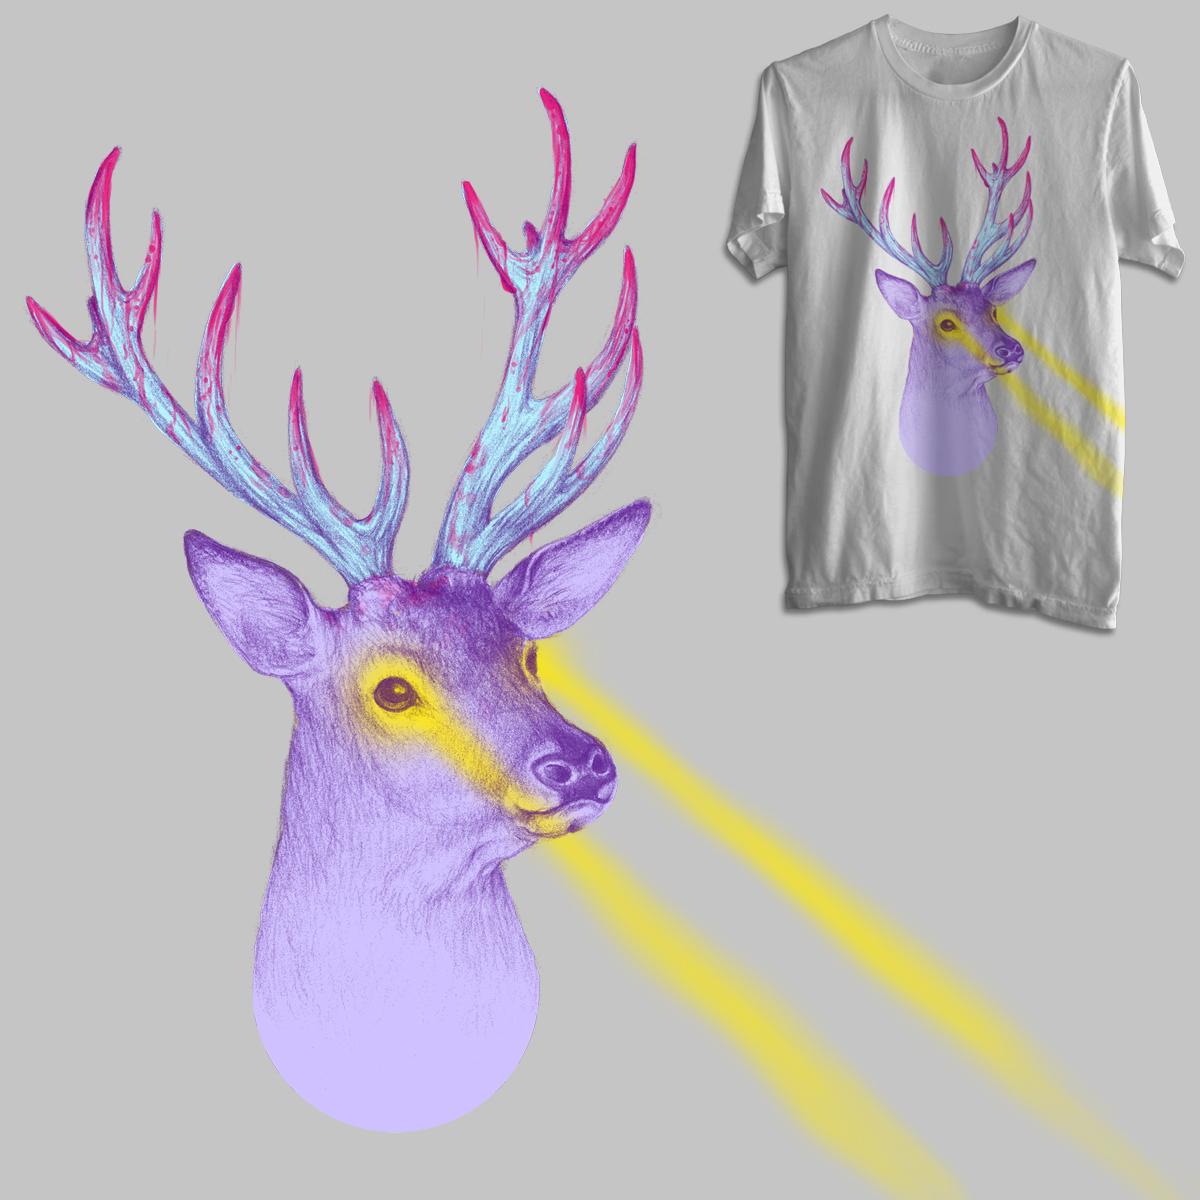 Not so deer by Milan_ on Threadless